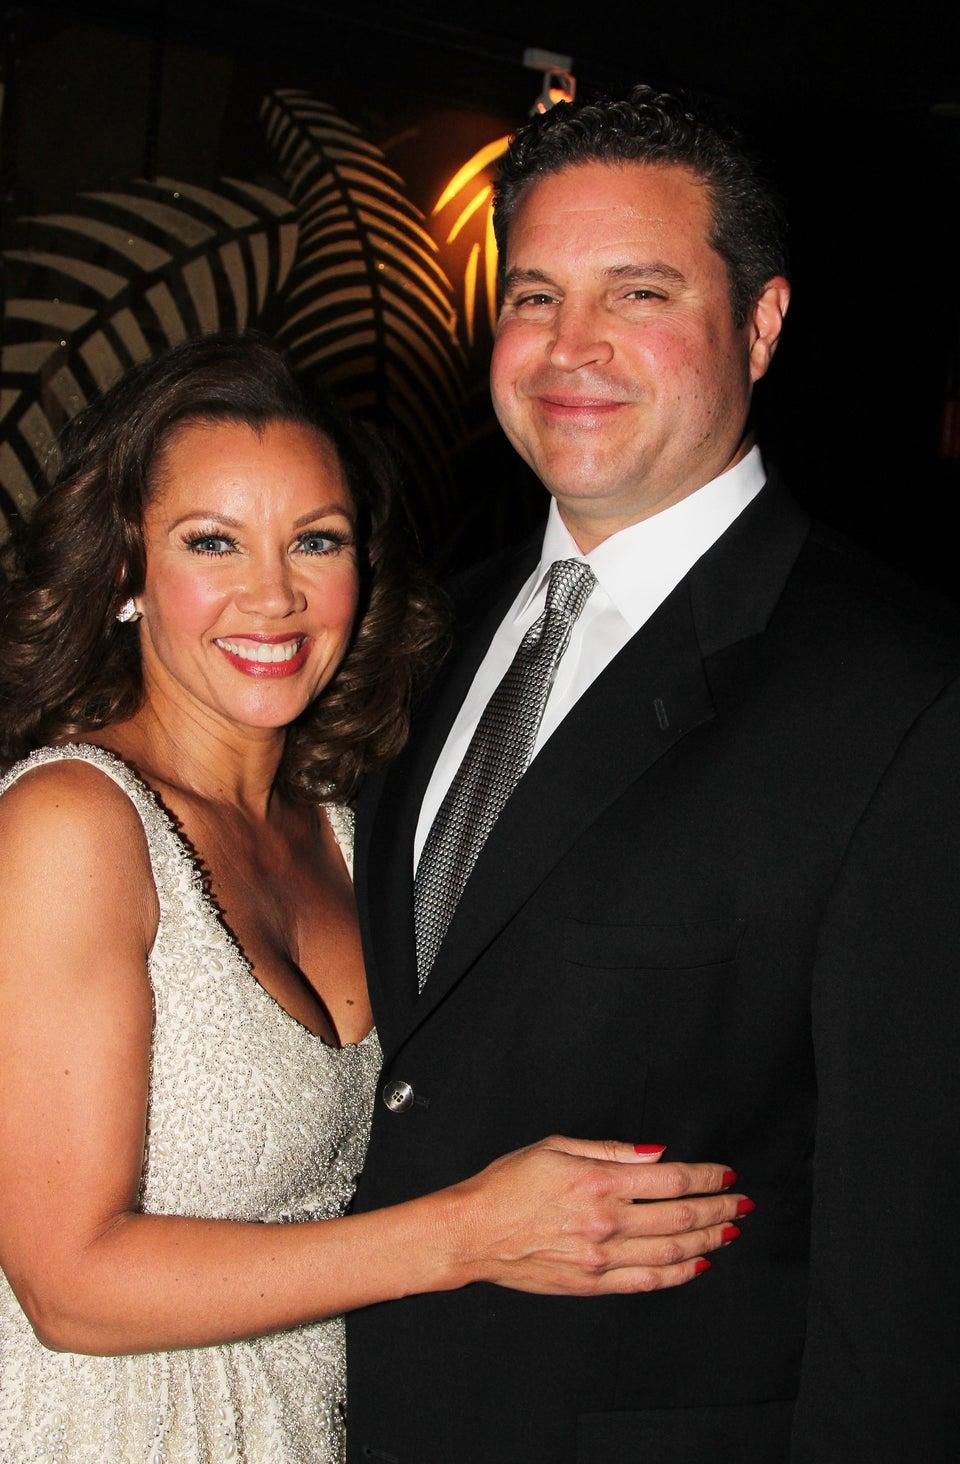 Vanessa Williams and Husband Jim Skrip Celebrate Second Wedding Anniversary